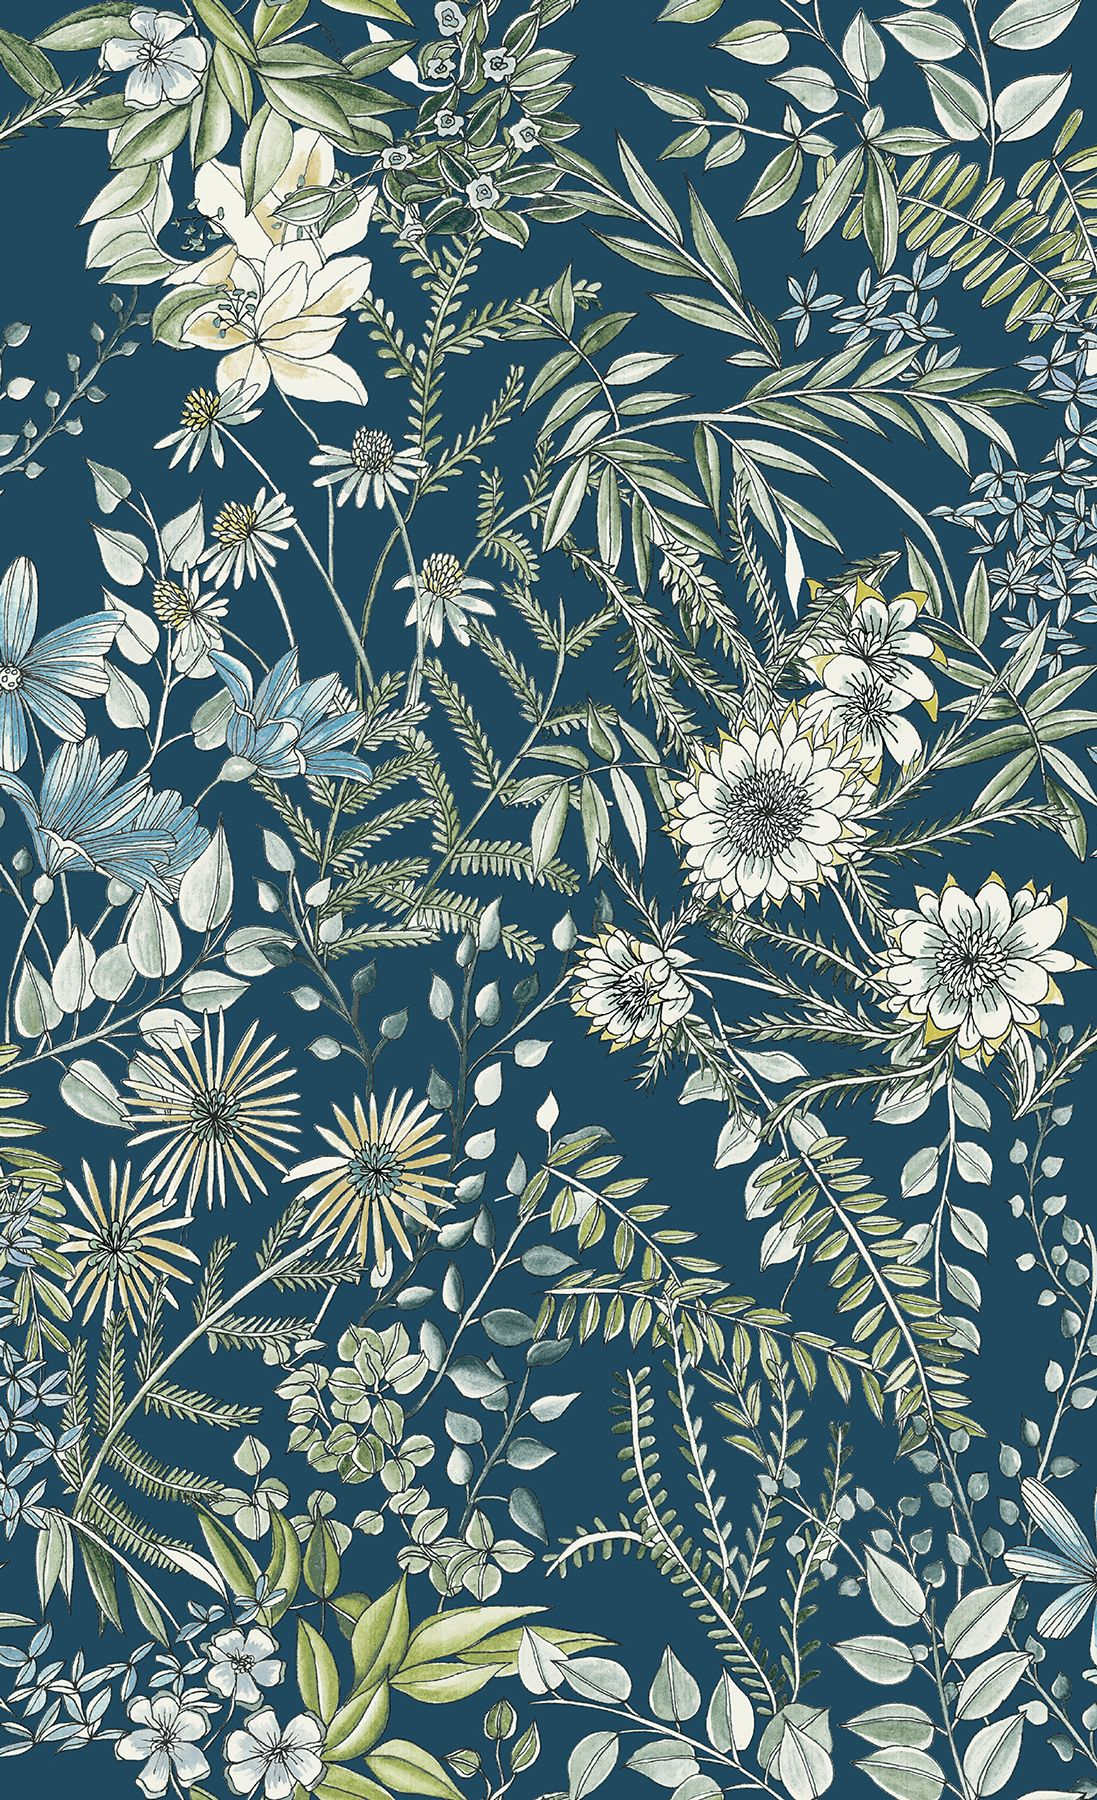 Full Bloom Navy Floral Wallpaper Blue Floral Wallpaper Green